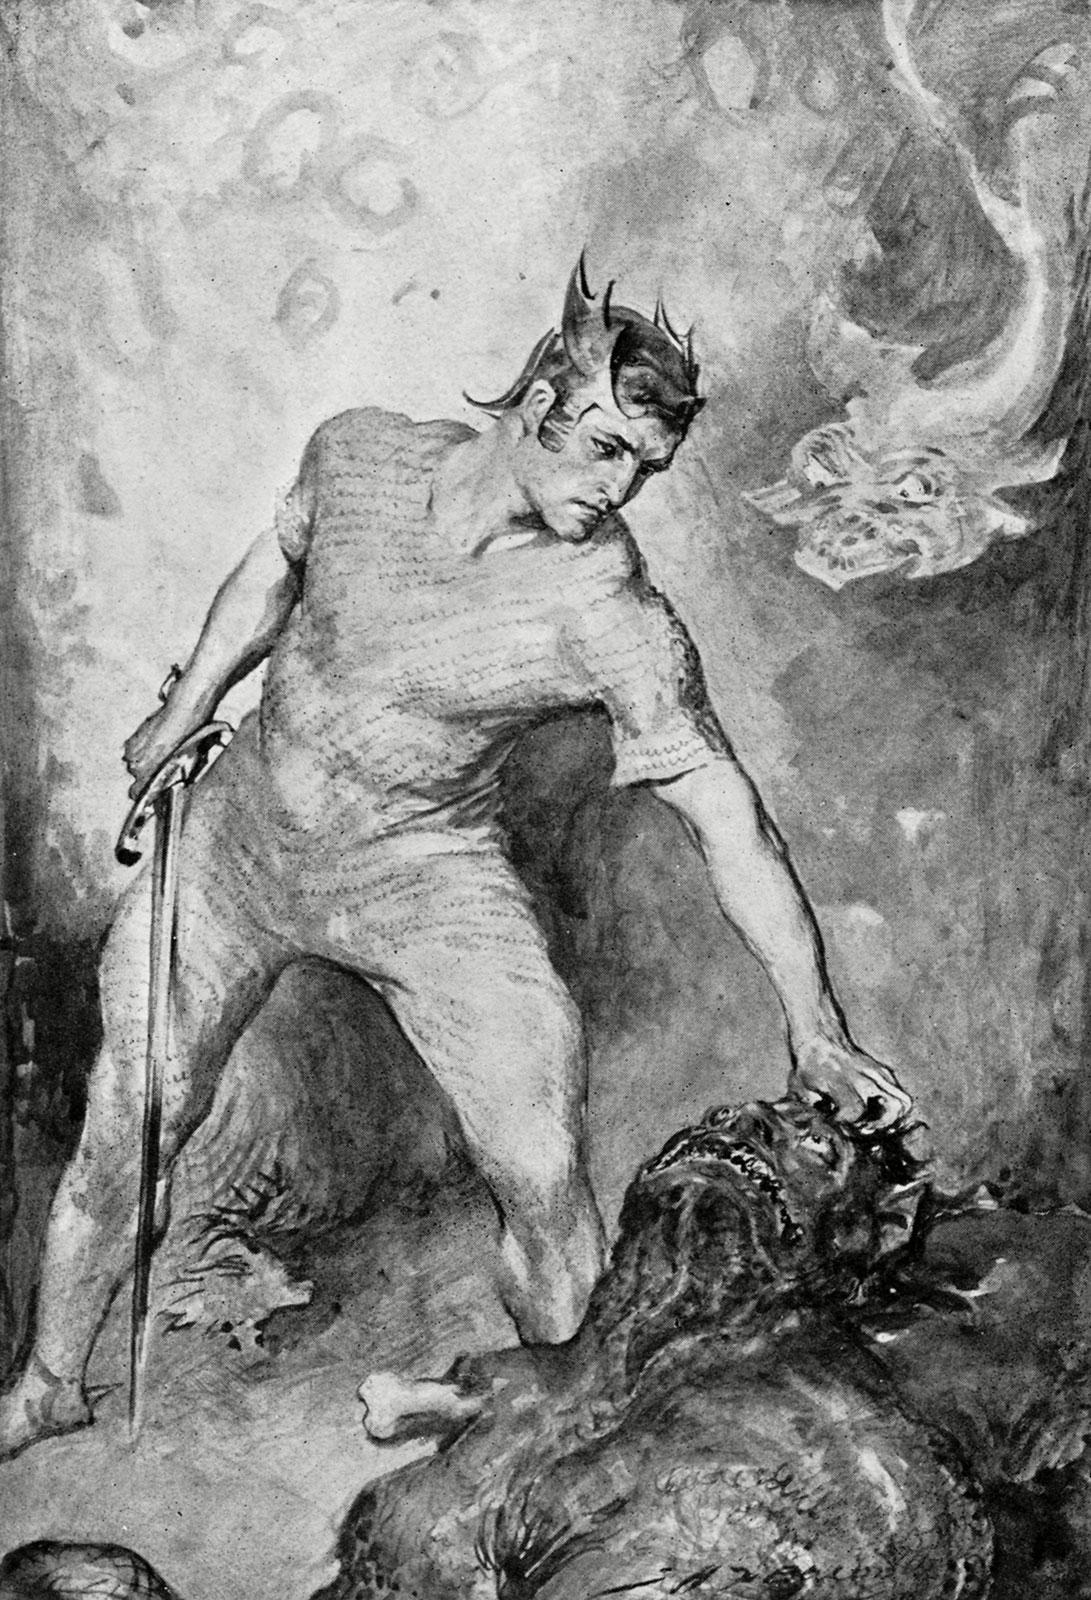 Legendary Heroes in History - Beowulf